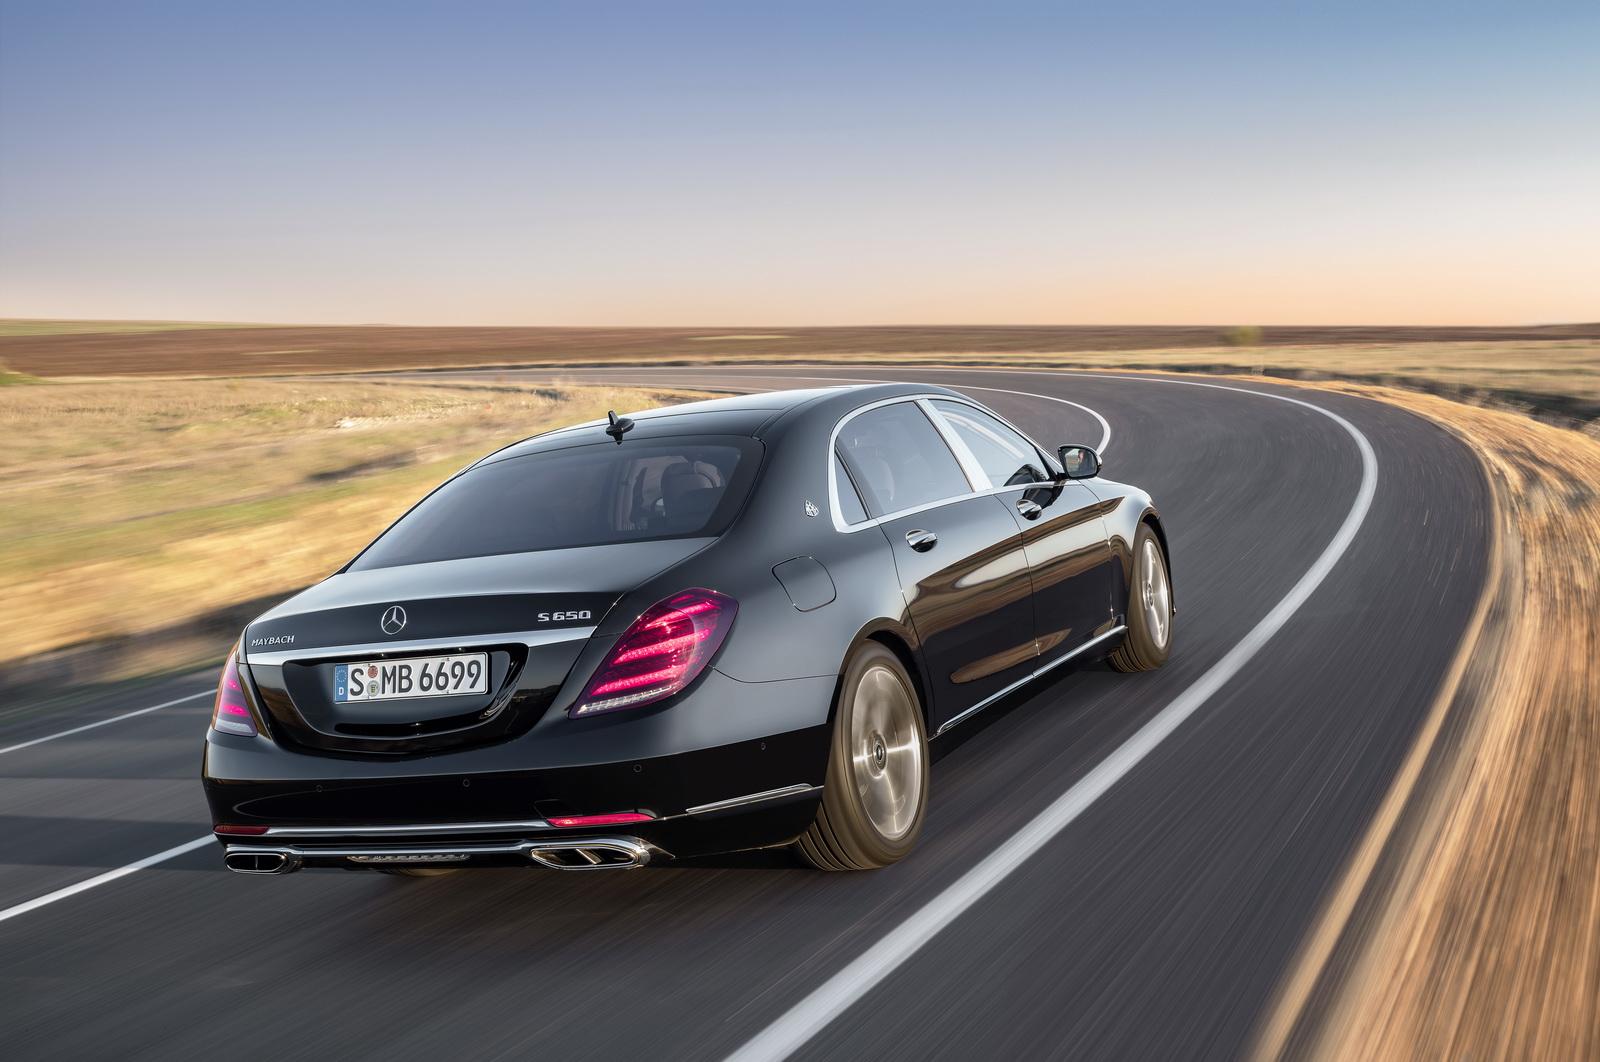 2018 mercedes benz s class priced from under 91k carscoops for Mercedes benz s650 price